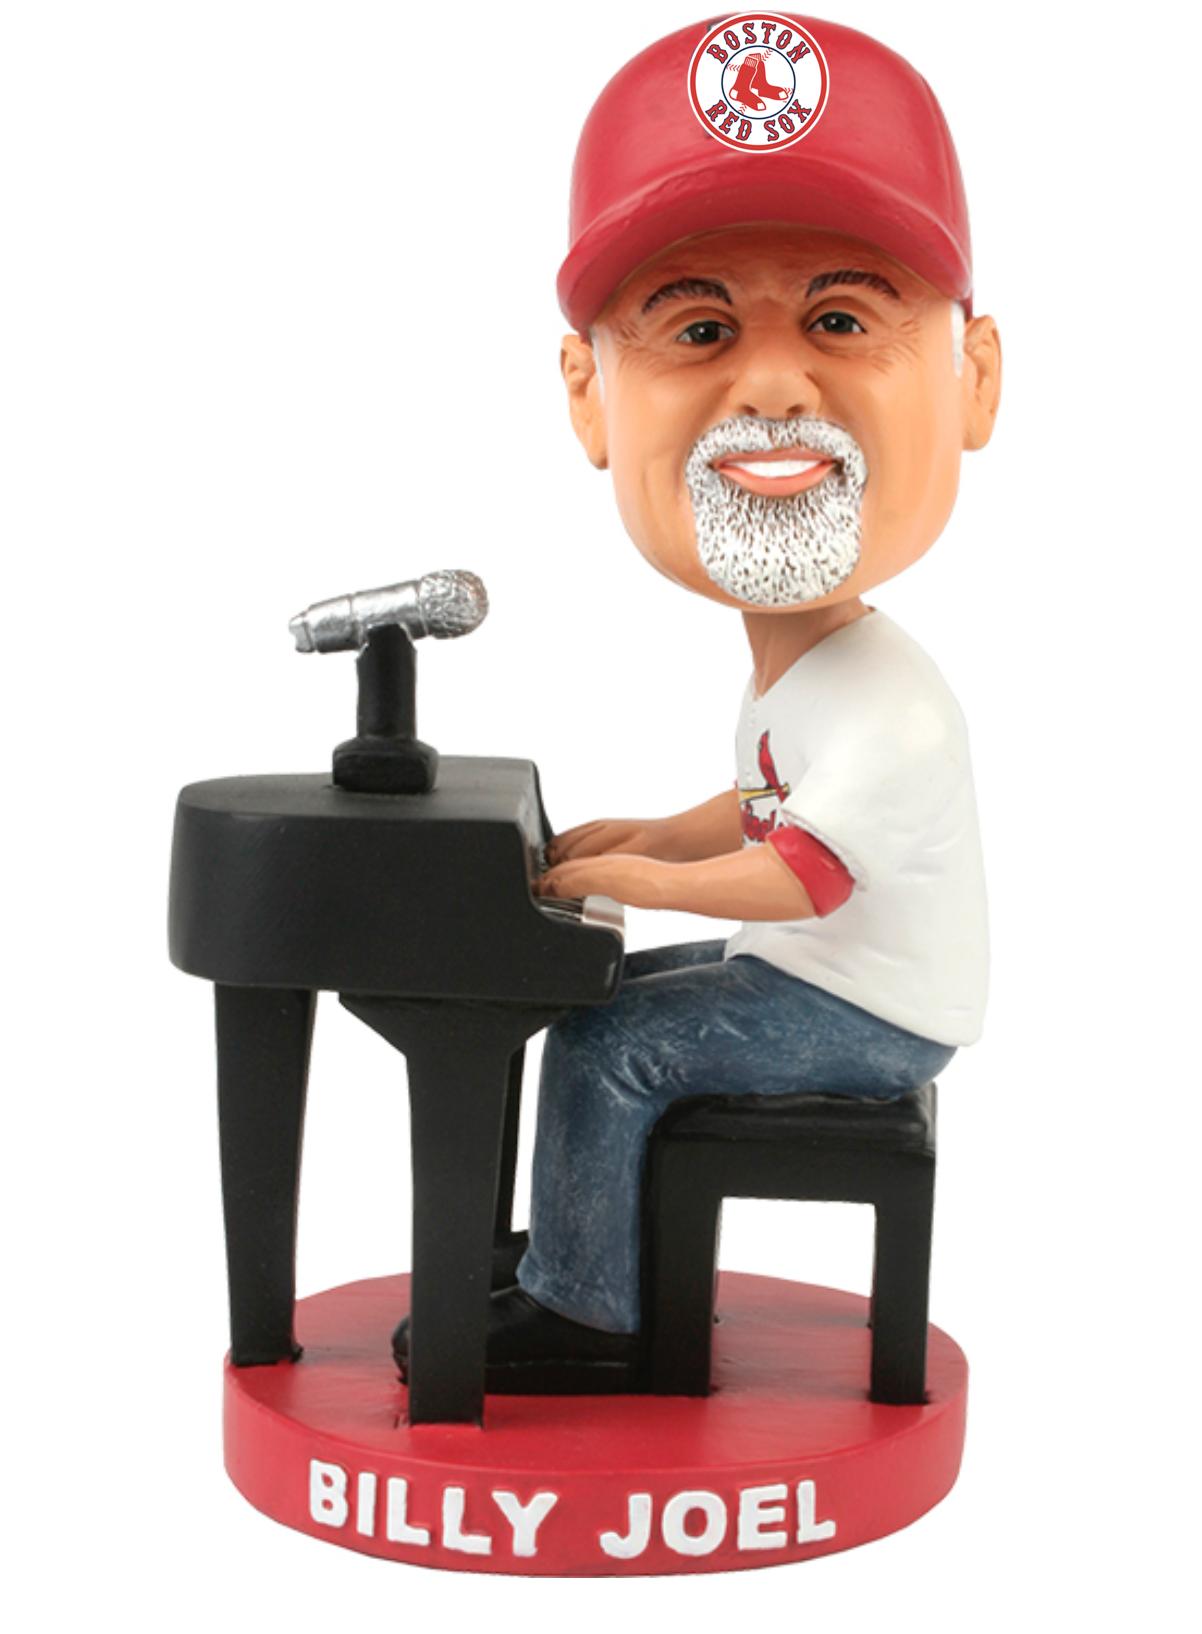 billy joel sets summer tour of baseball stadiums